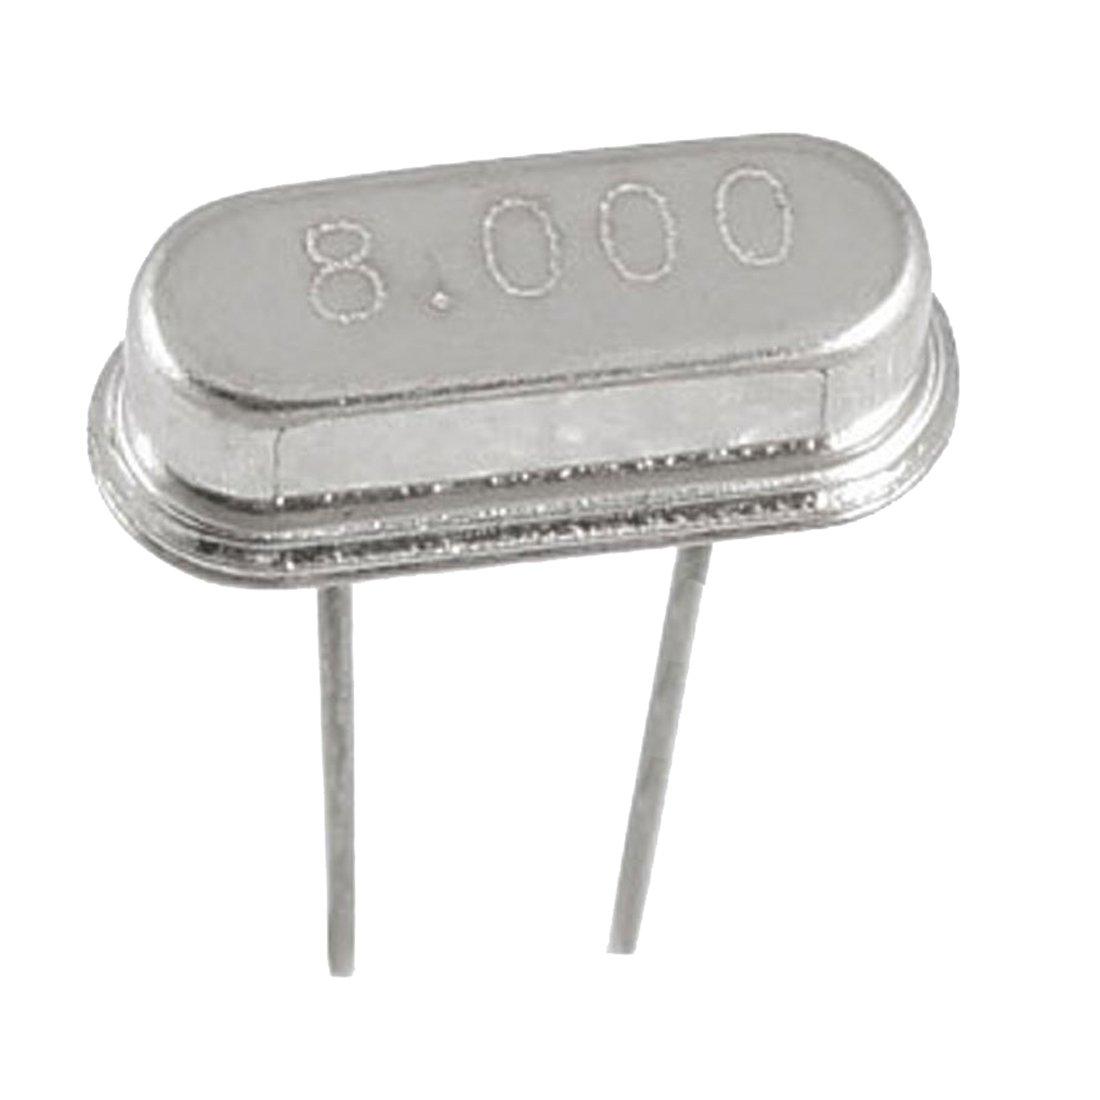 Crystal Oscillator - SODIAL(R) 5 x 8.000 MHz 8 MHz Crystal HC-49S DIP Mounting Crystal Oscillator